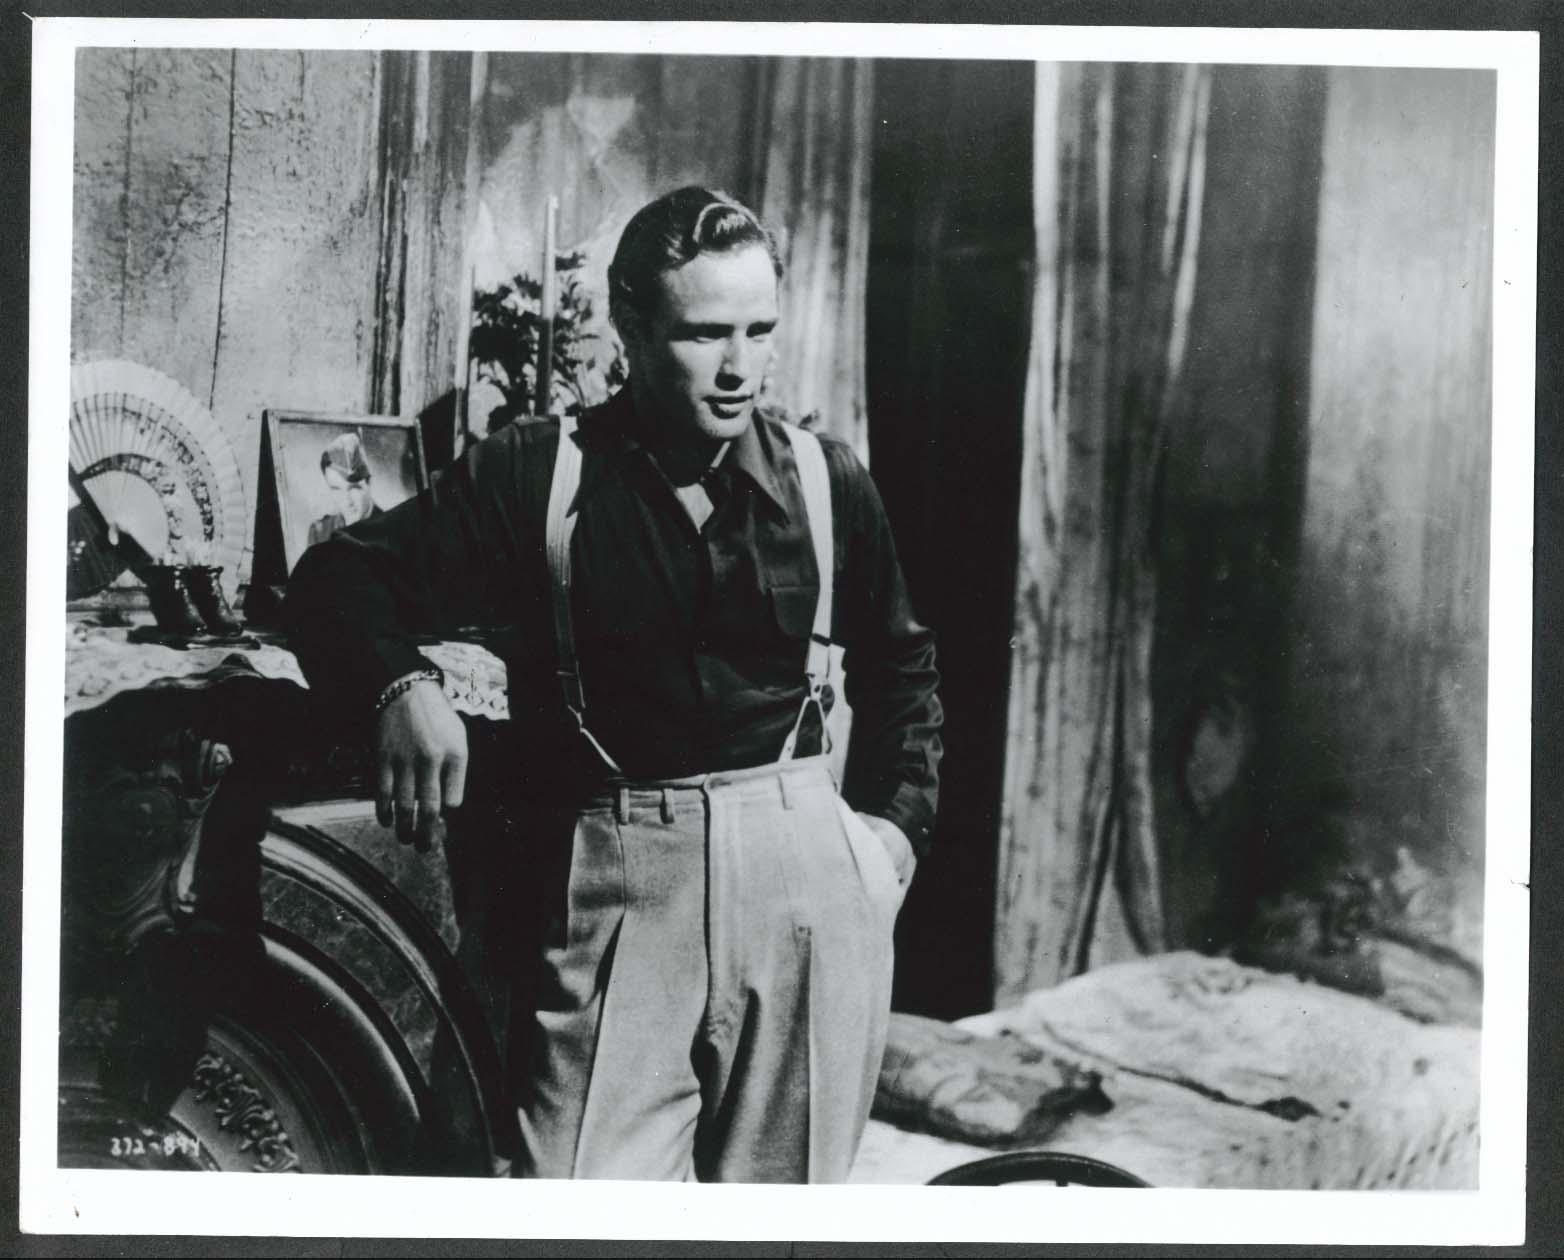 Image for Marlon Brando 8x10 photograph 1950s